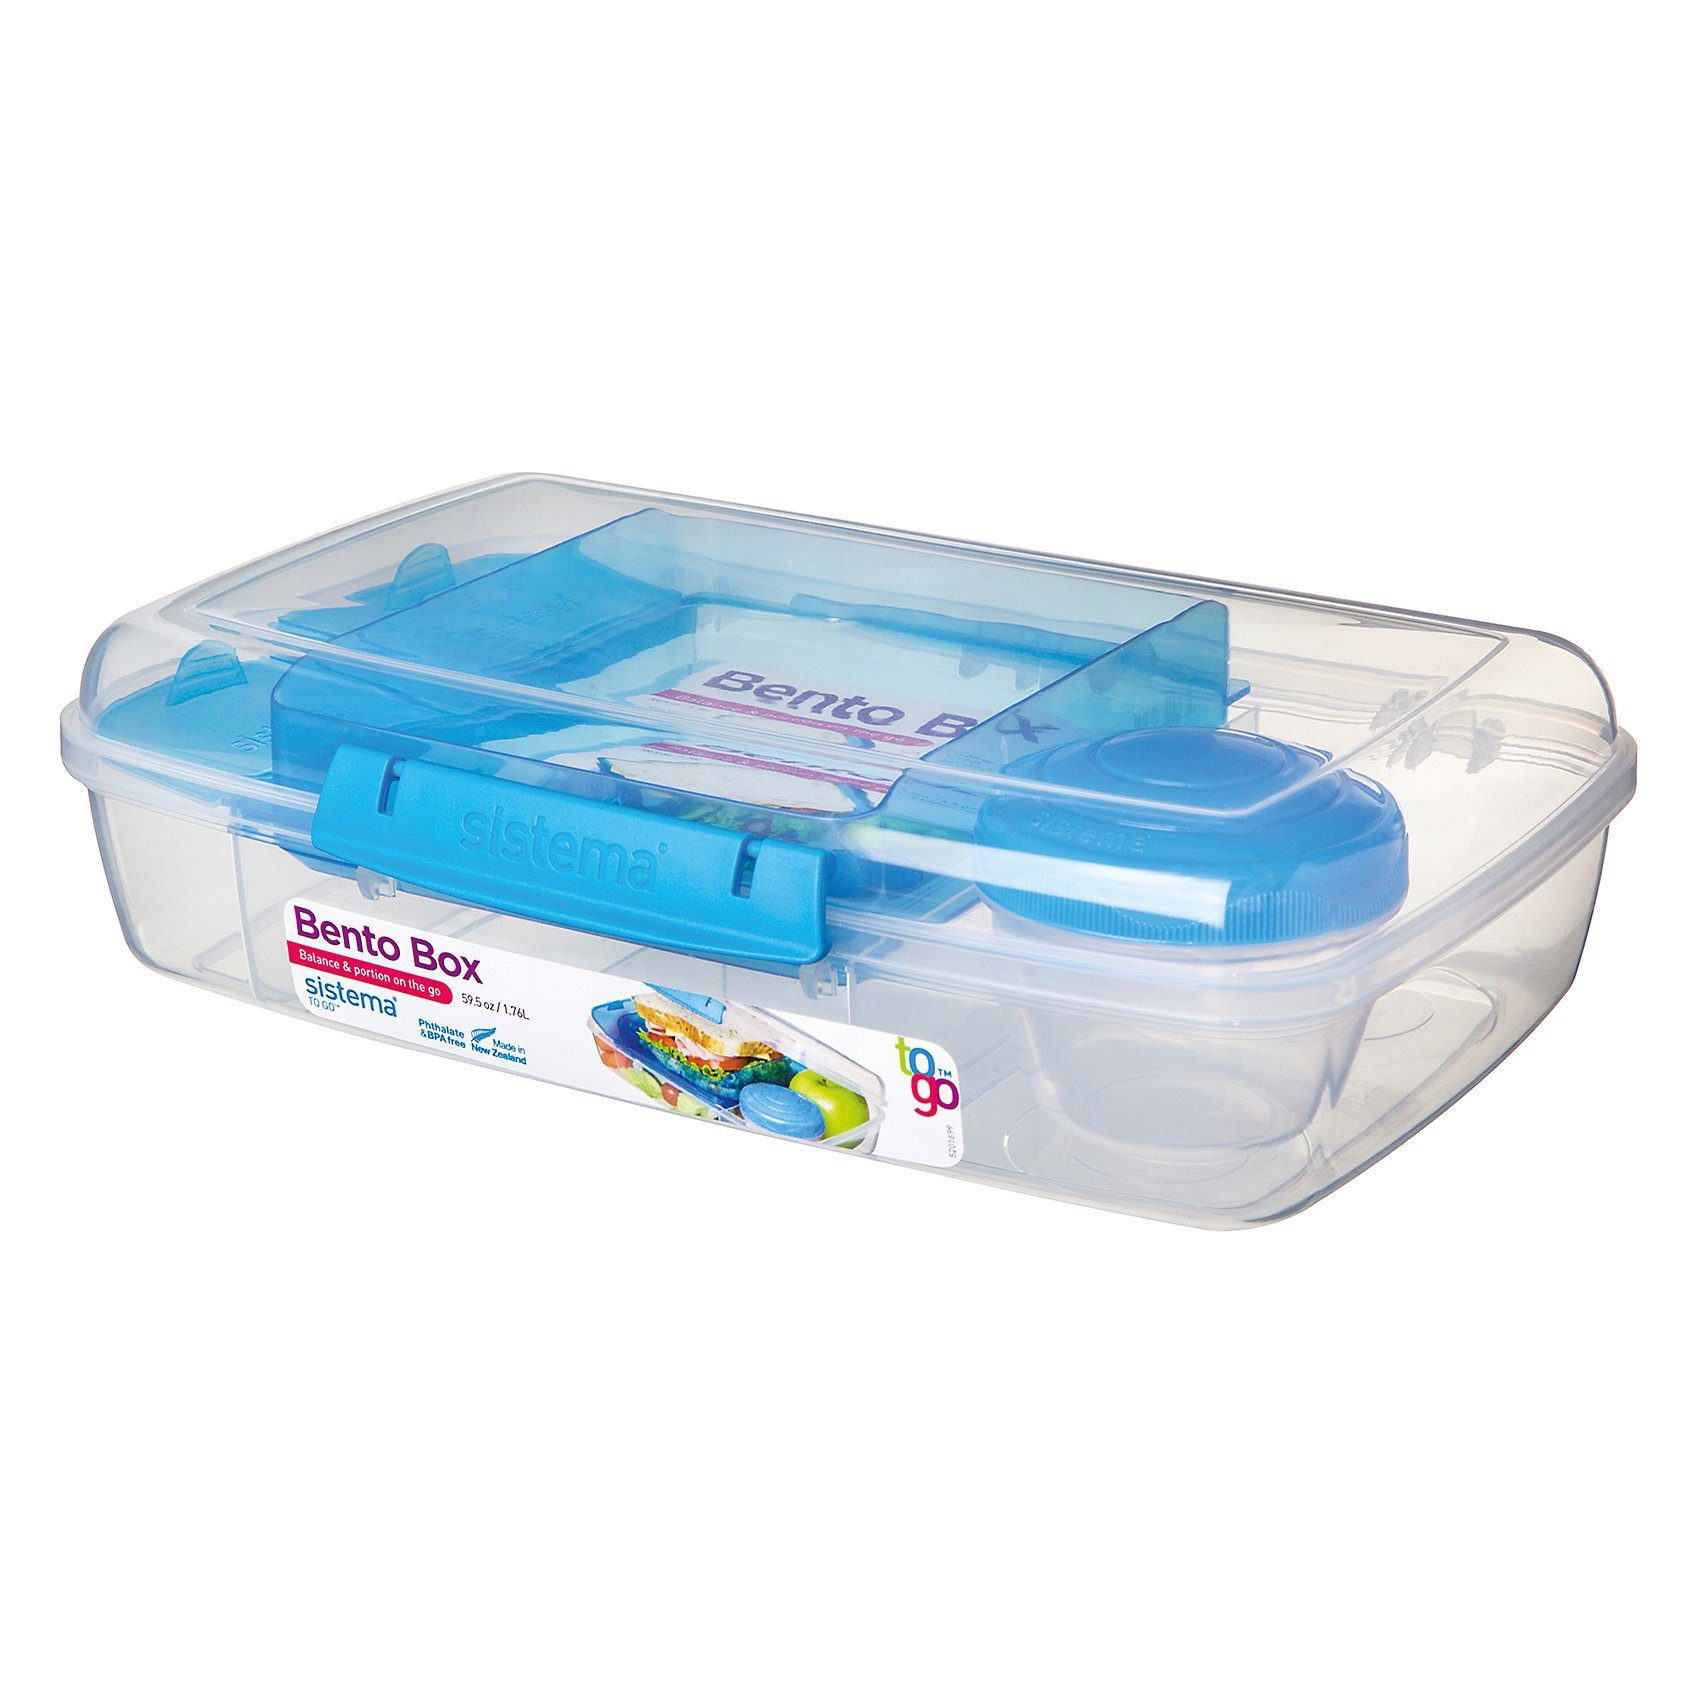 sistema LUNCH Brotdose Bento Box, inkl. Joghurt-Dose, blau